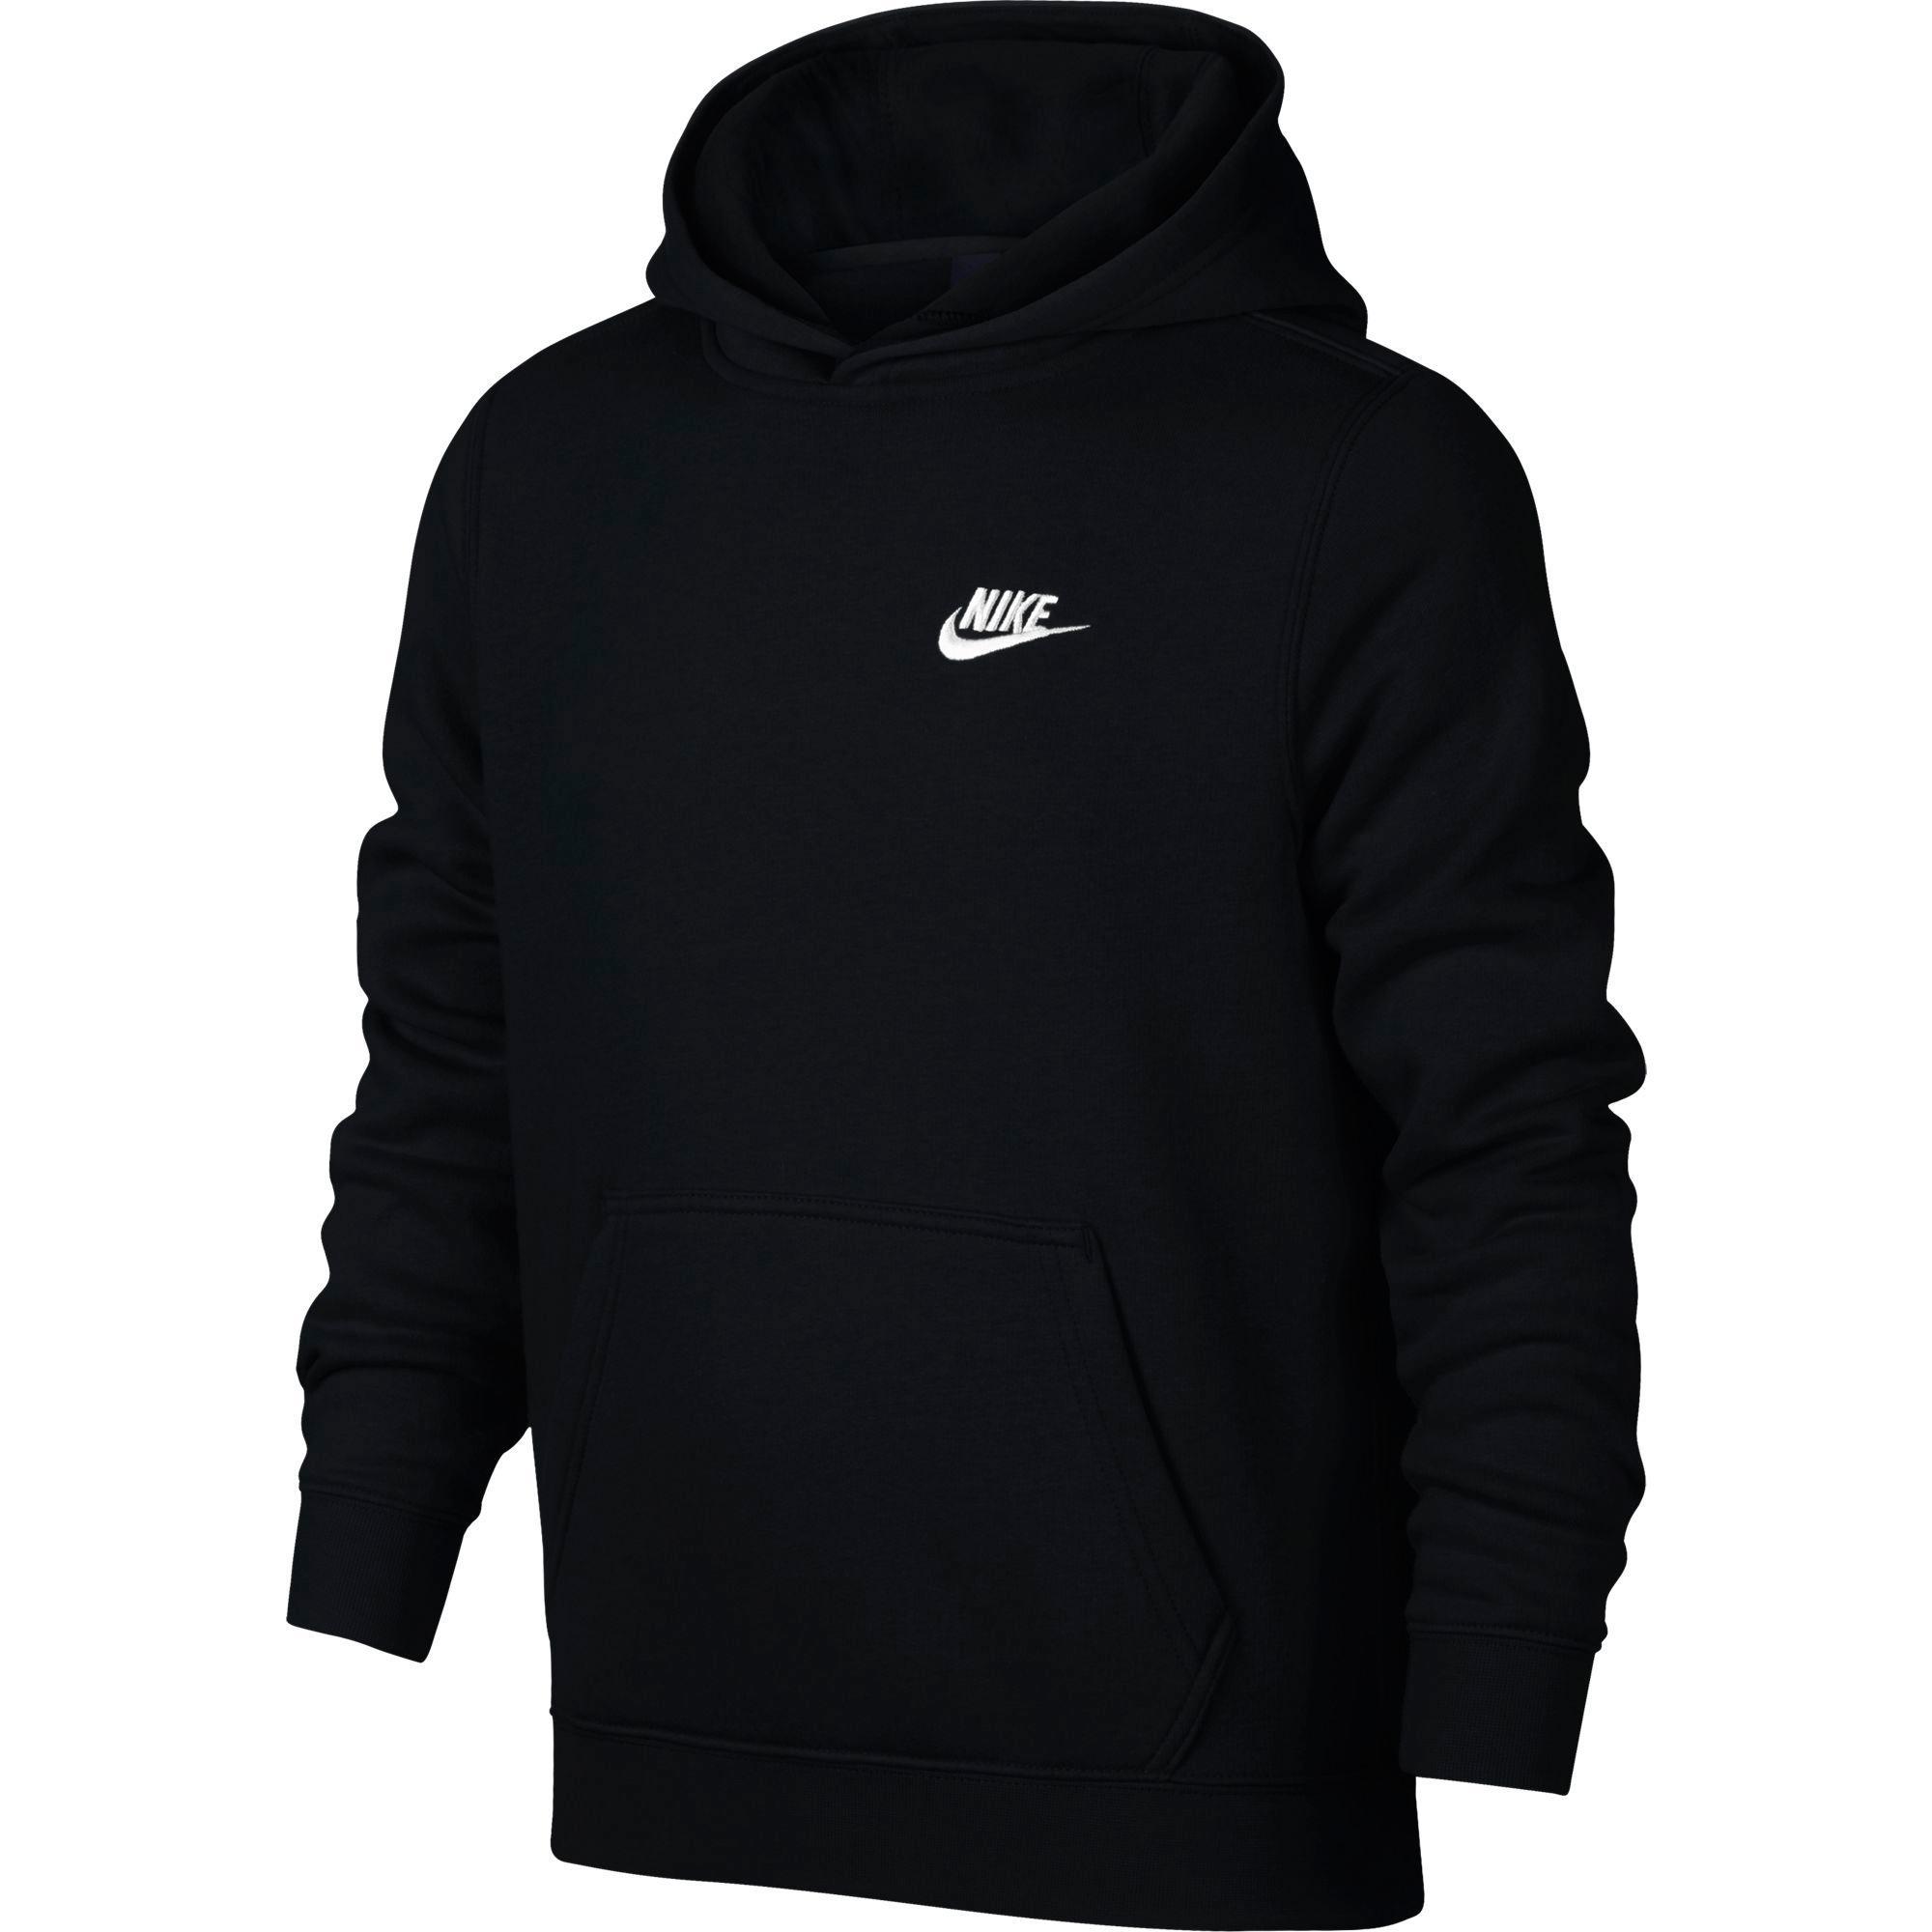 Nike Boys Sportswear Hoodie - Black - Tennisnuts.com